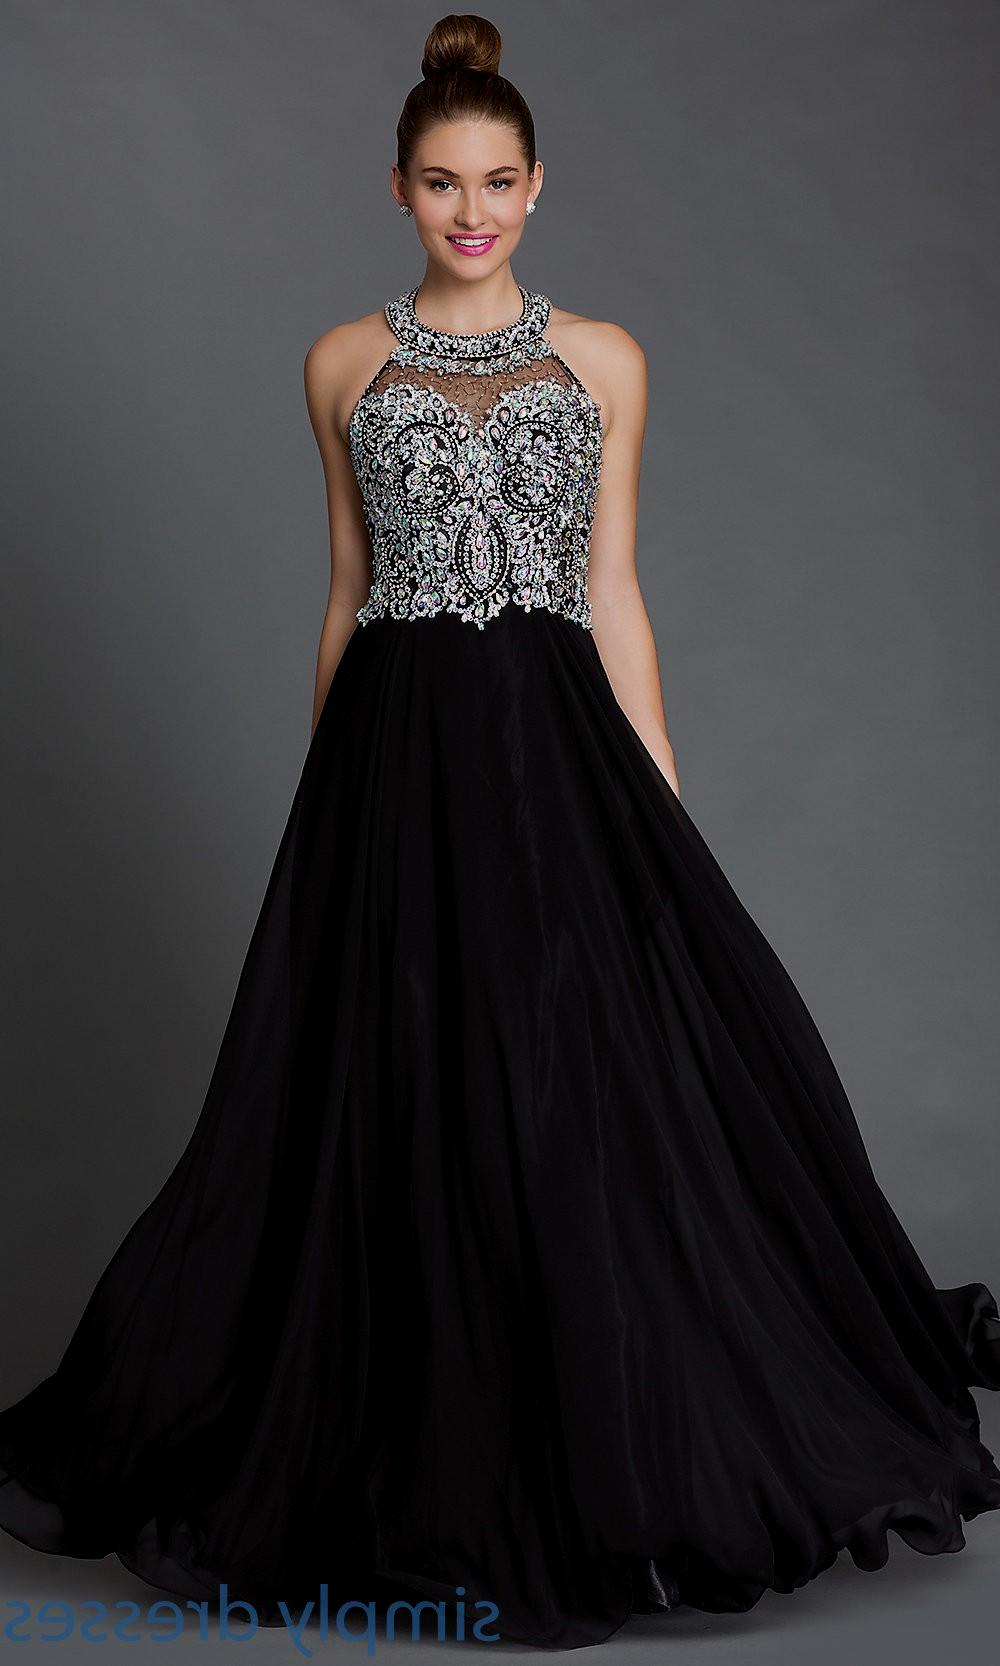 halter top evening dresses photo - 1